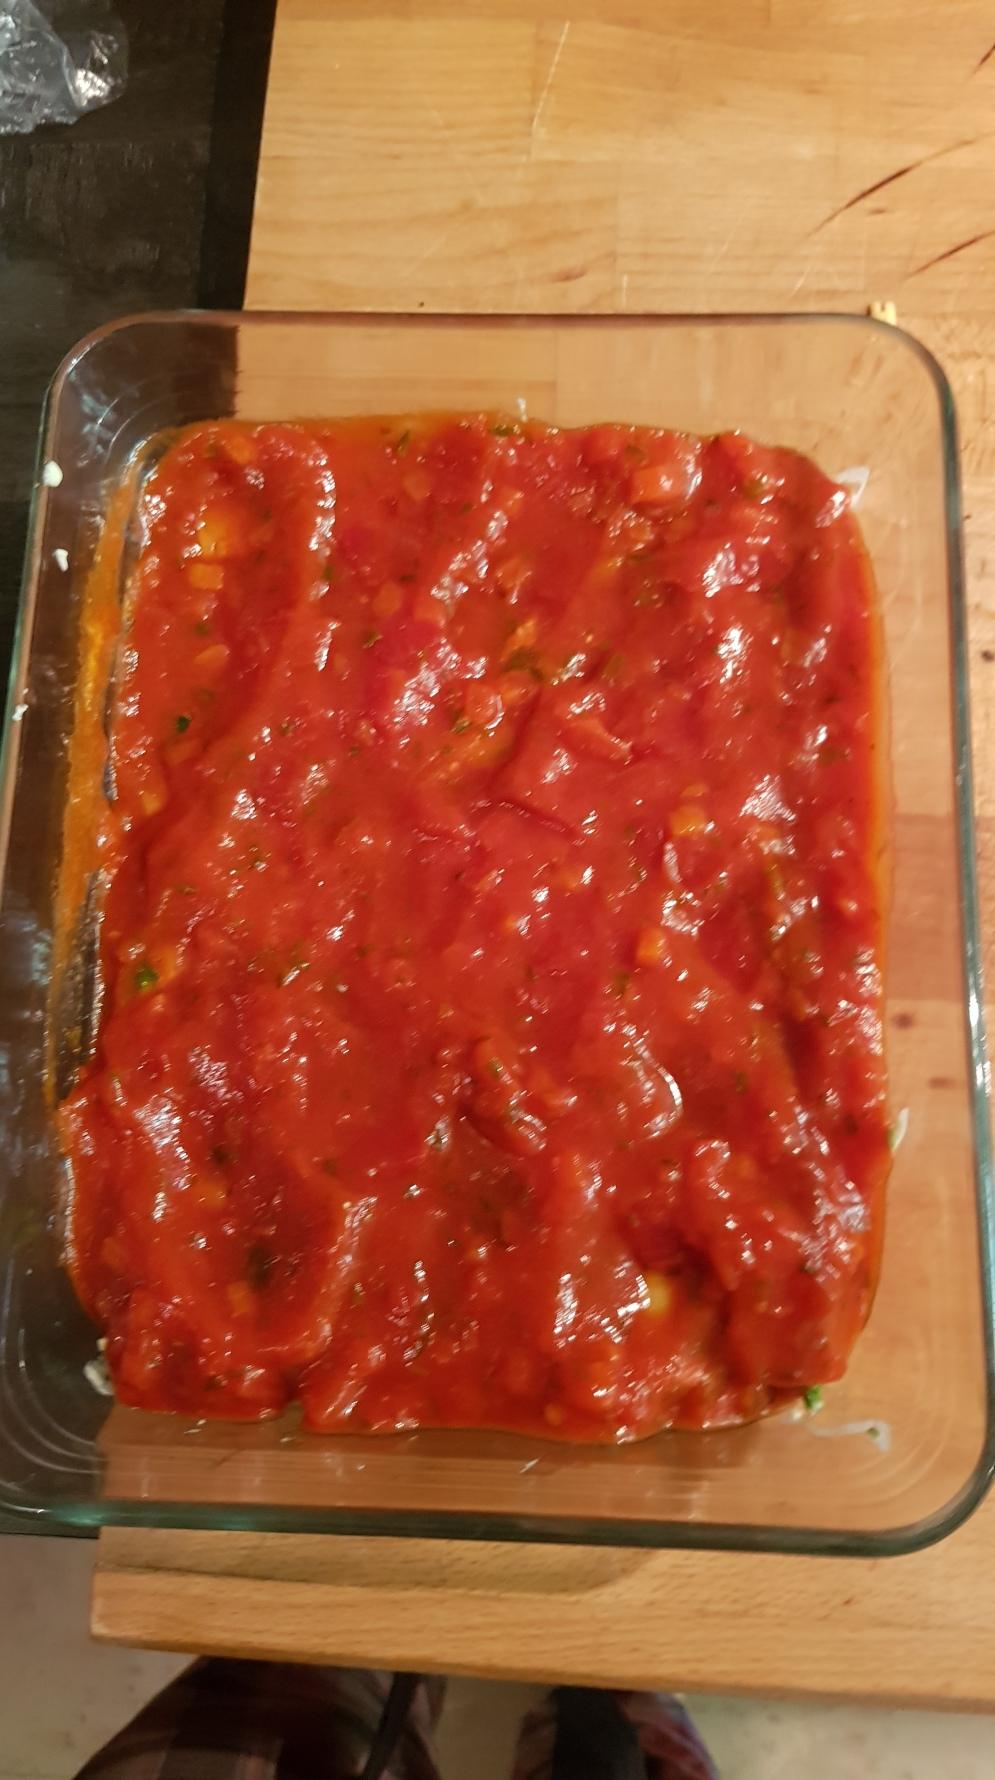 on recouvre de sauce tomate